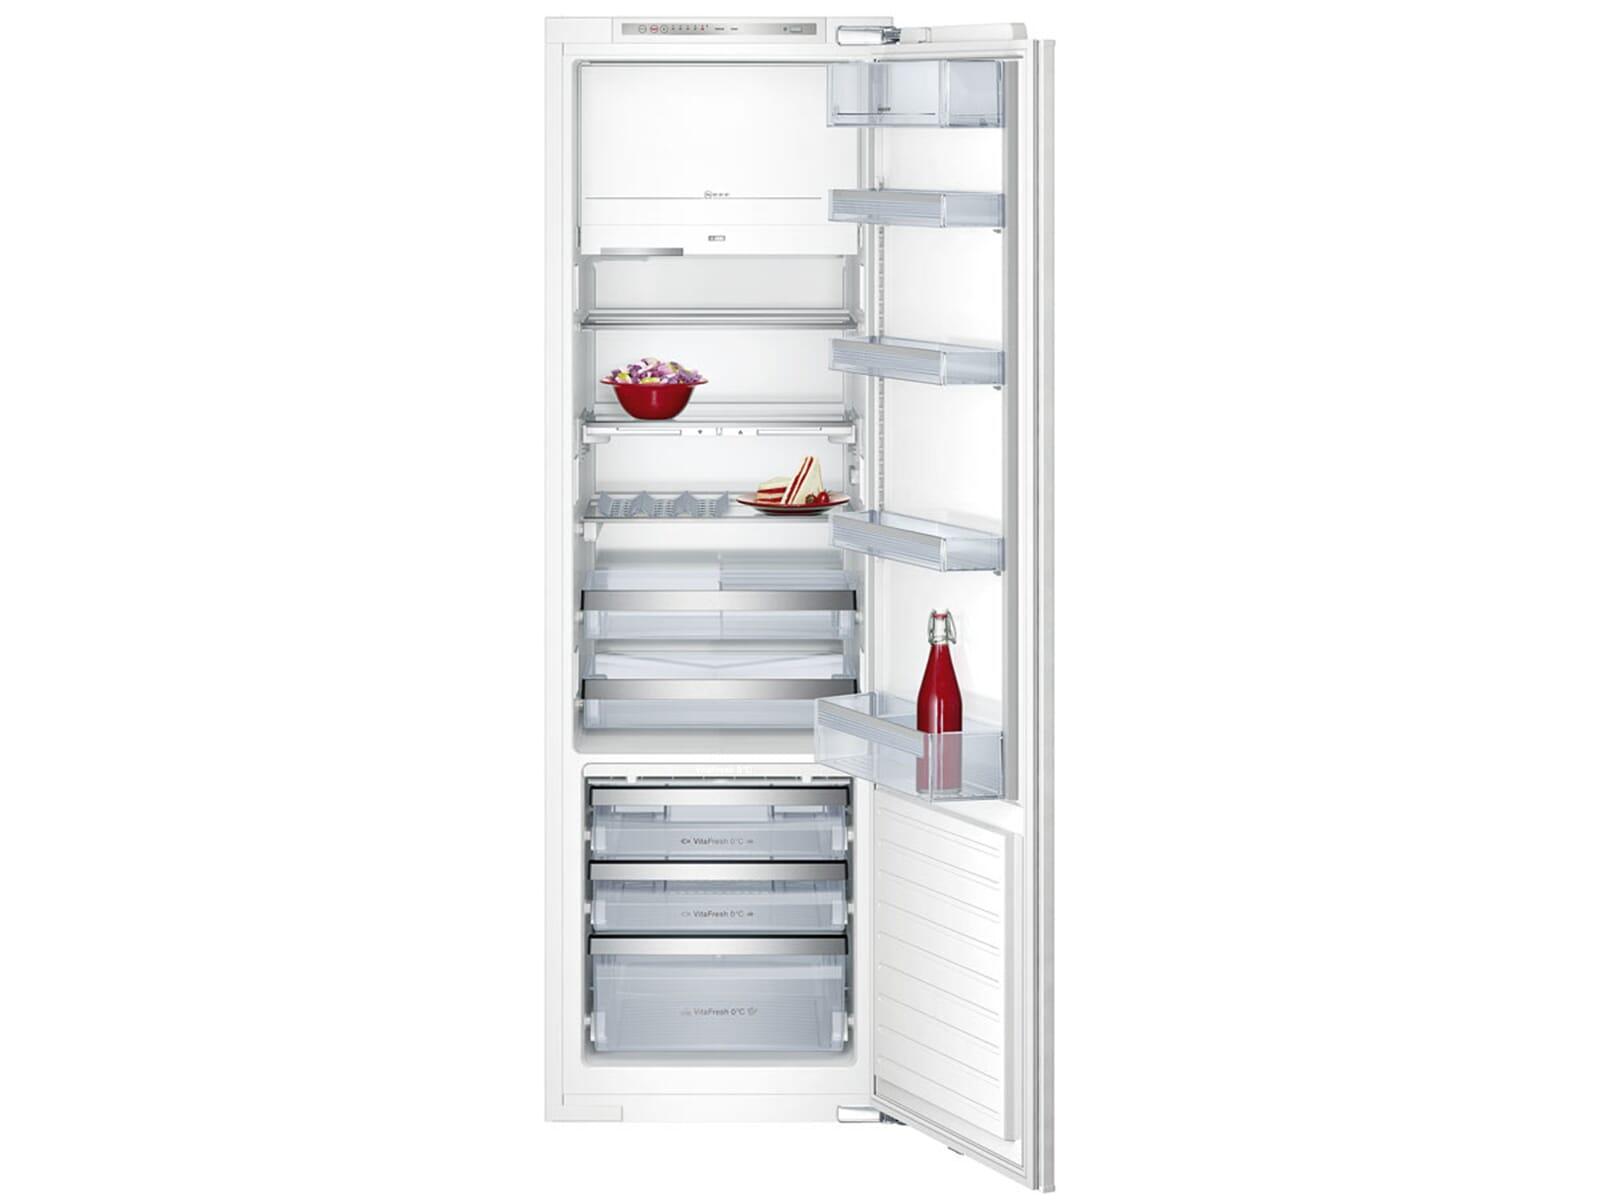 Side By Side Kühlschrank Neff : Neff k cool deluxe einbaukühlschrank